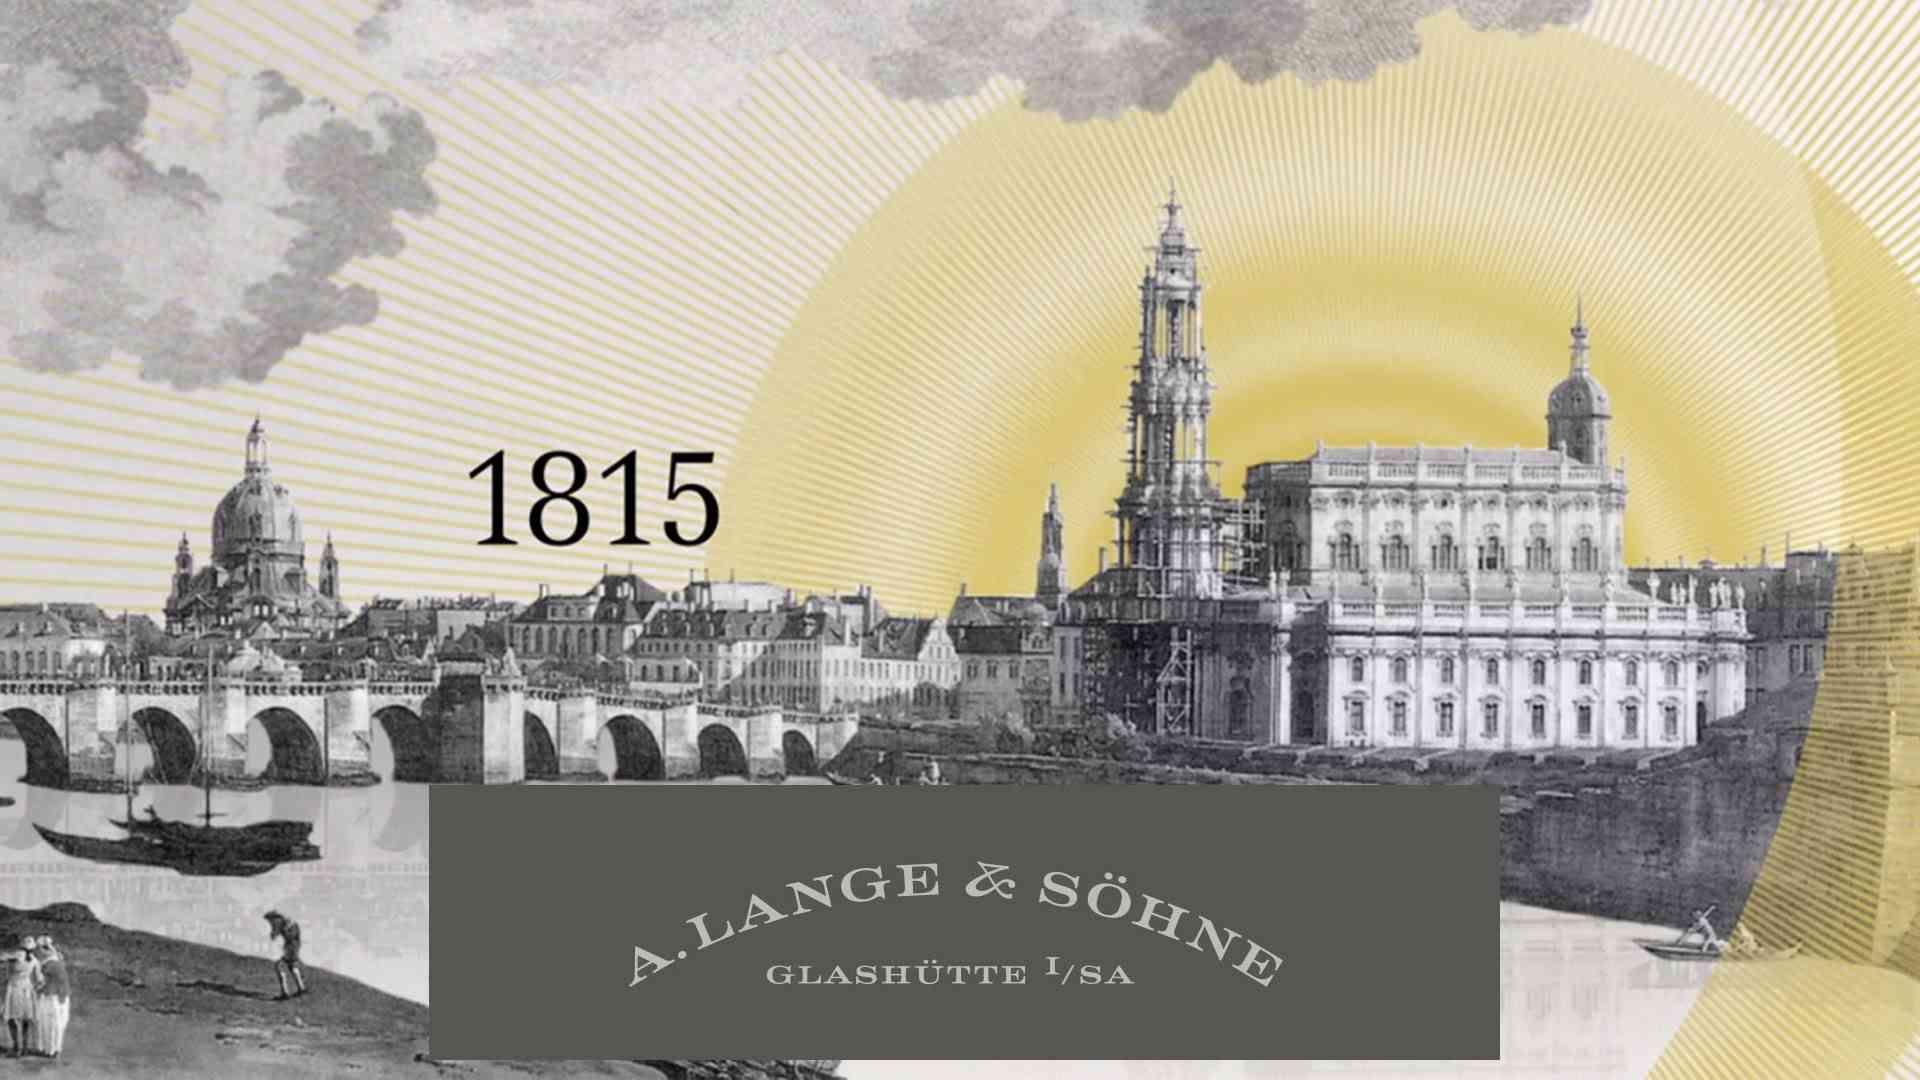 A. Lange & Söhne fabrica